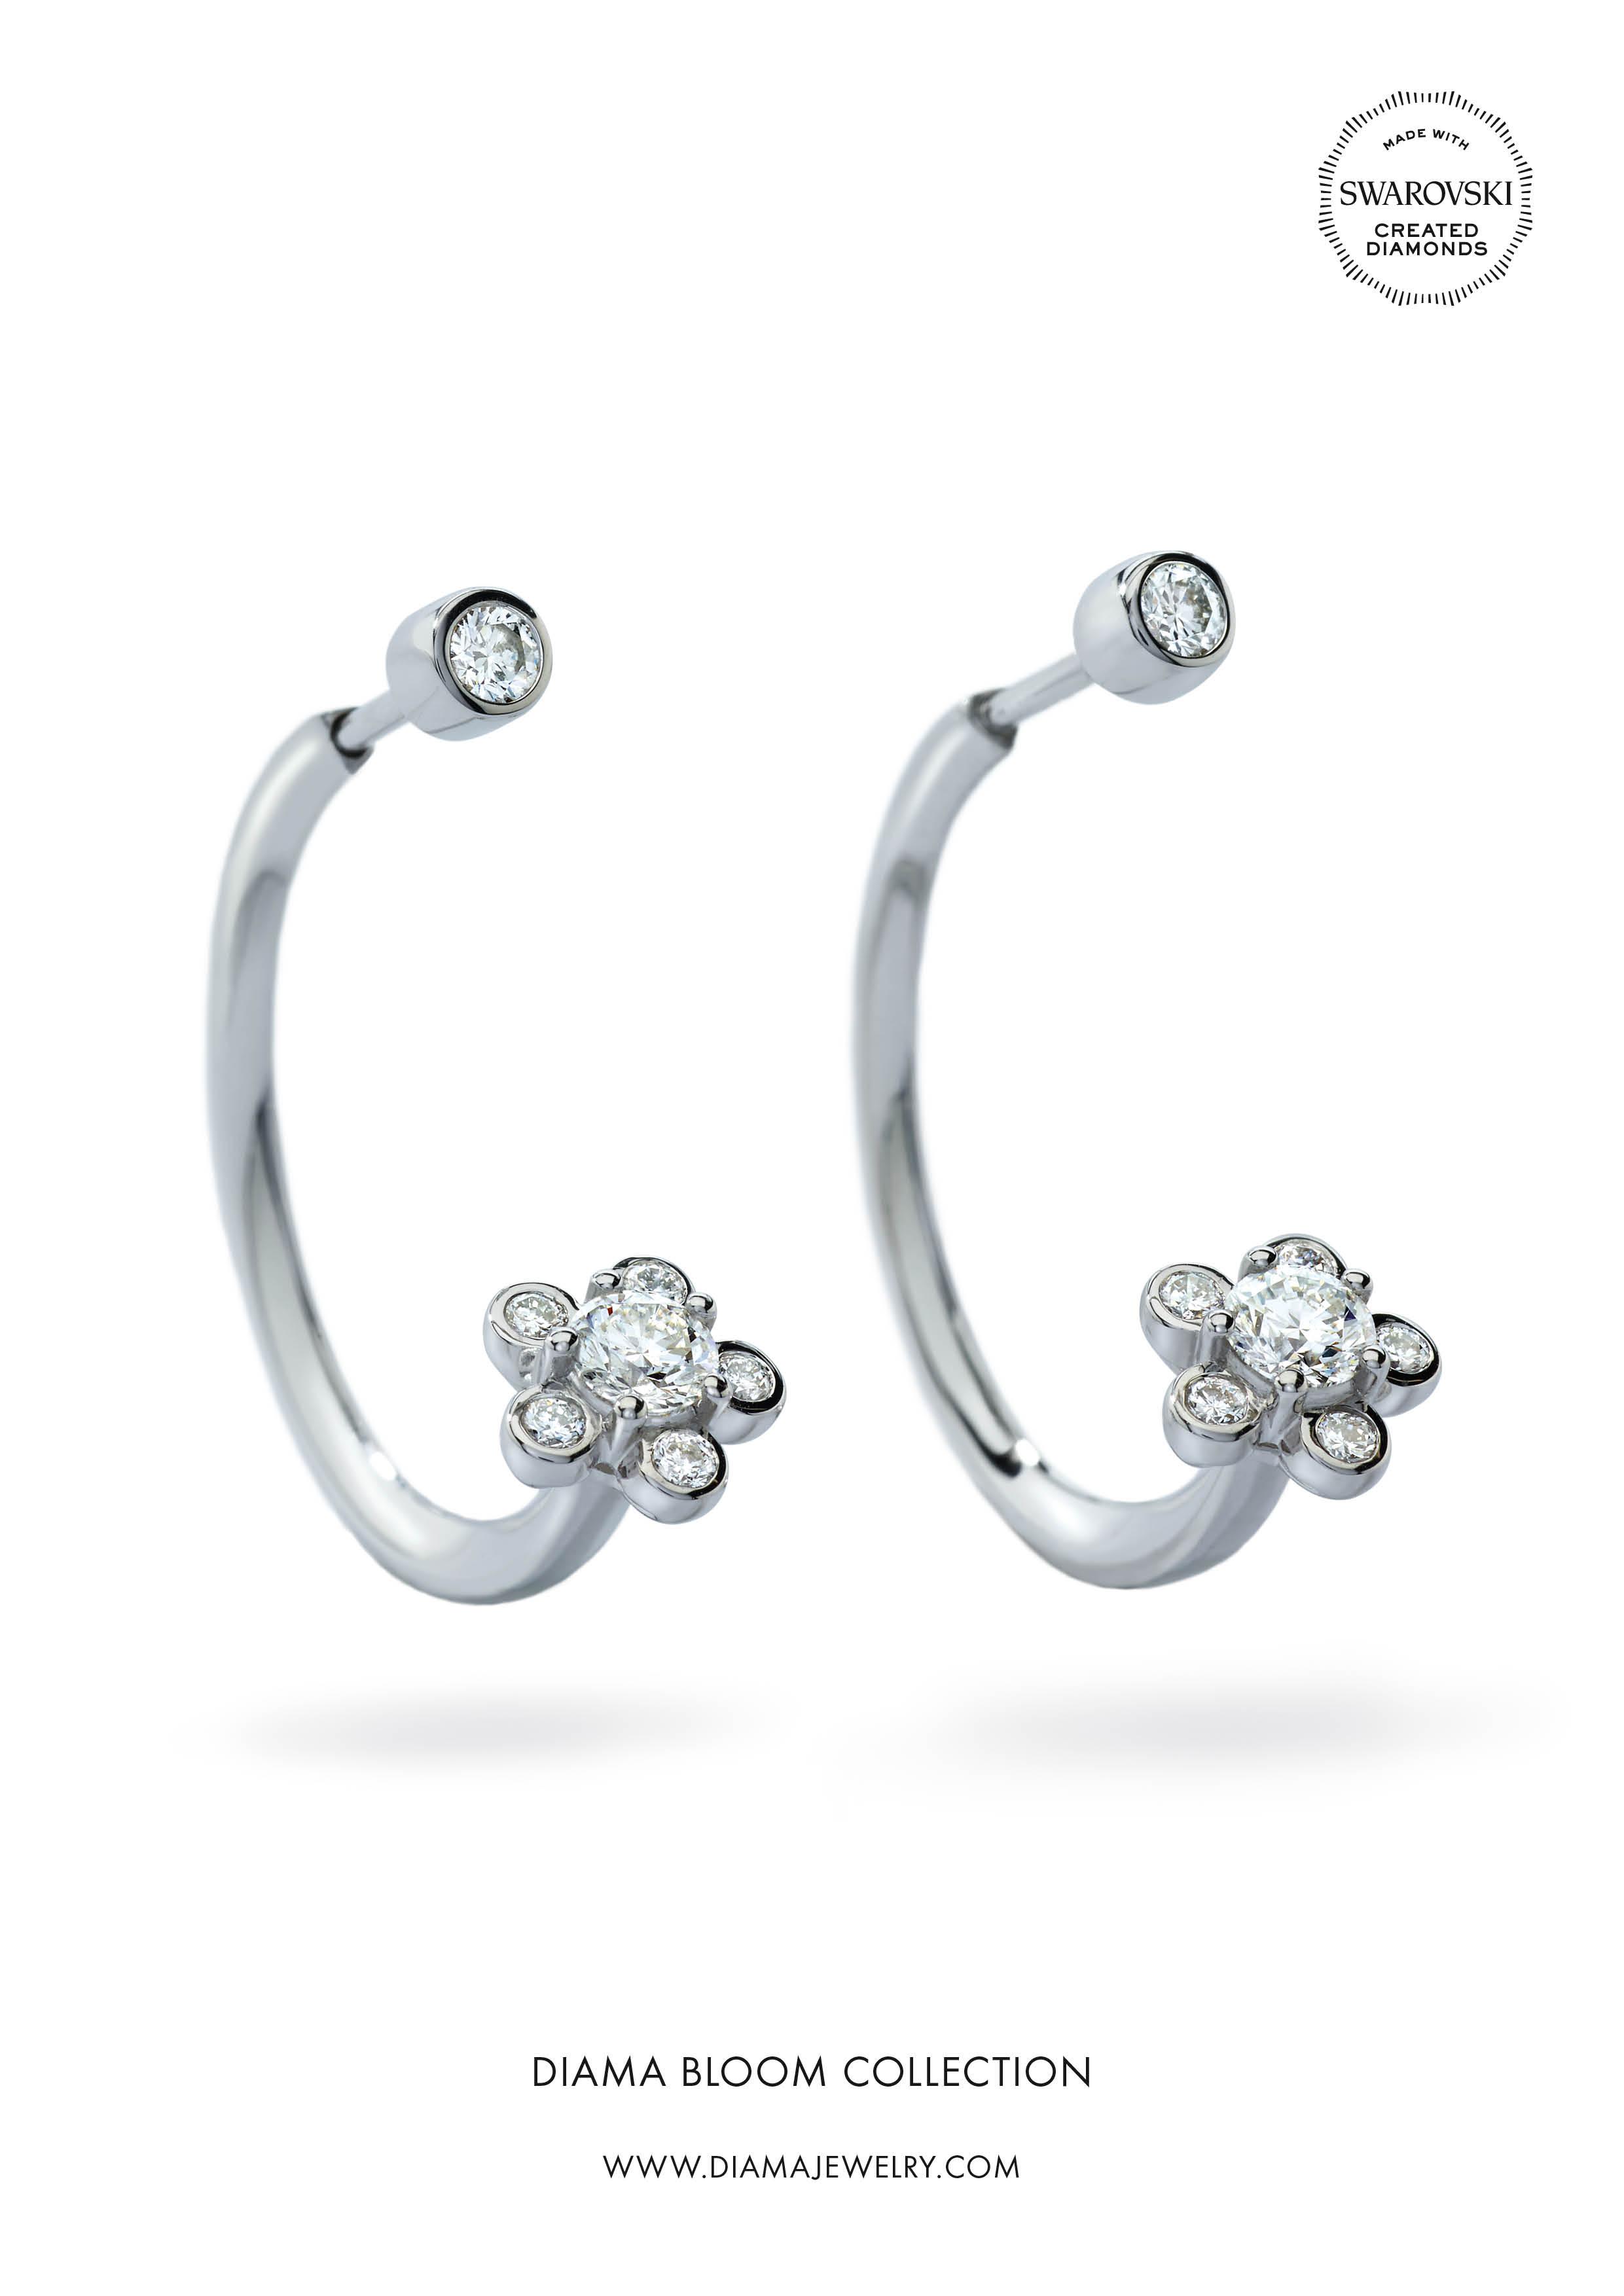 adc96aac331b Diama featuring Swarovski Created Diamonds - VO+ Jewels   Luxury Magazine